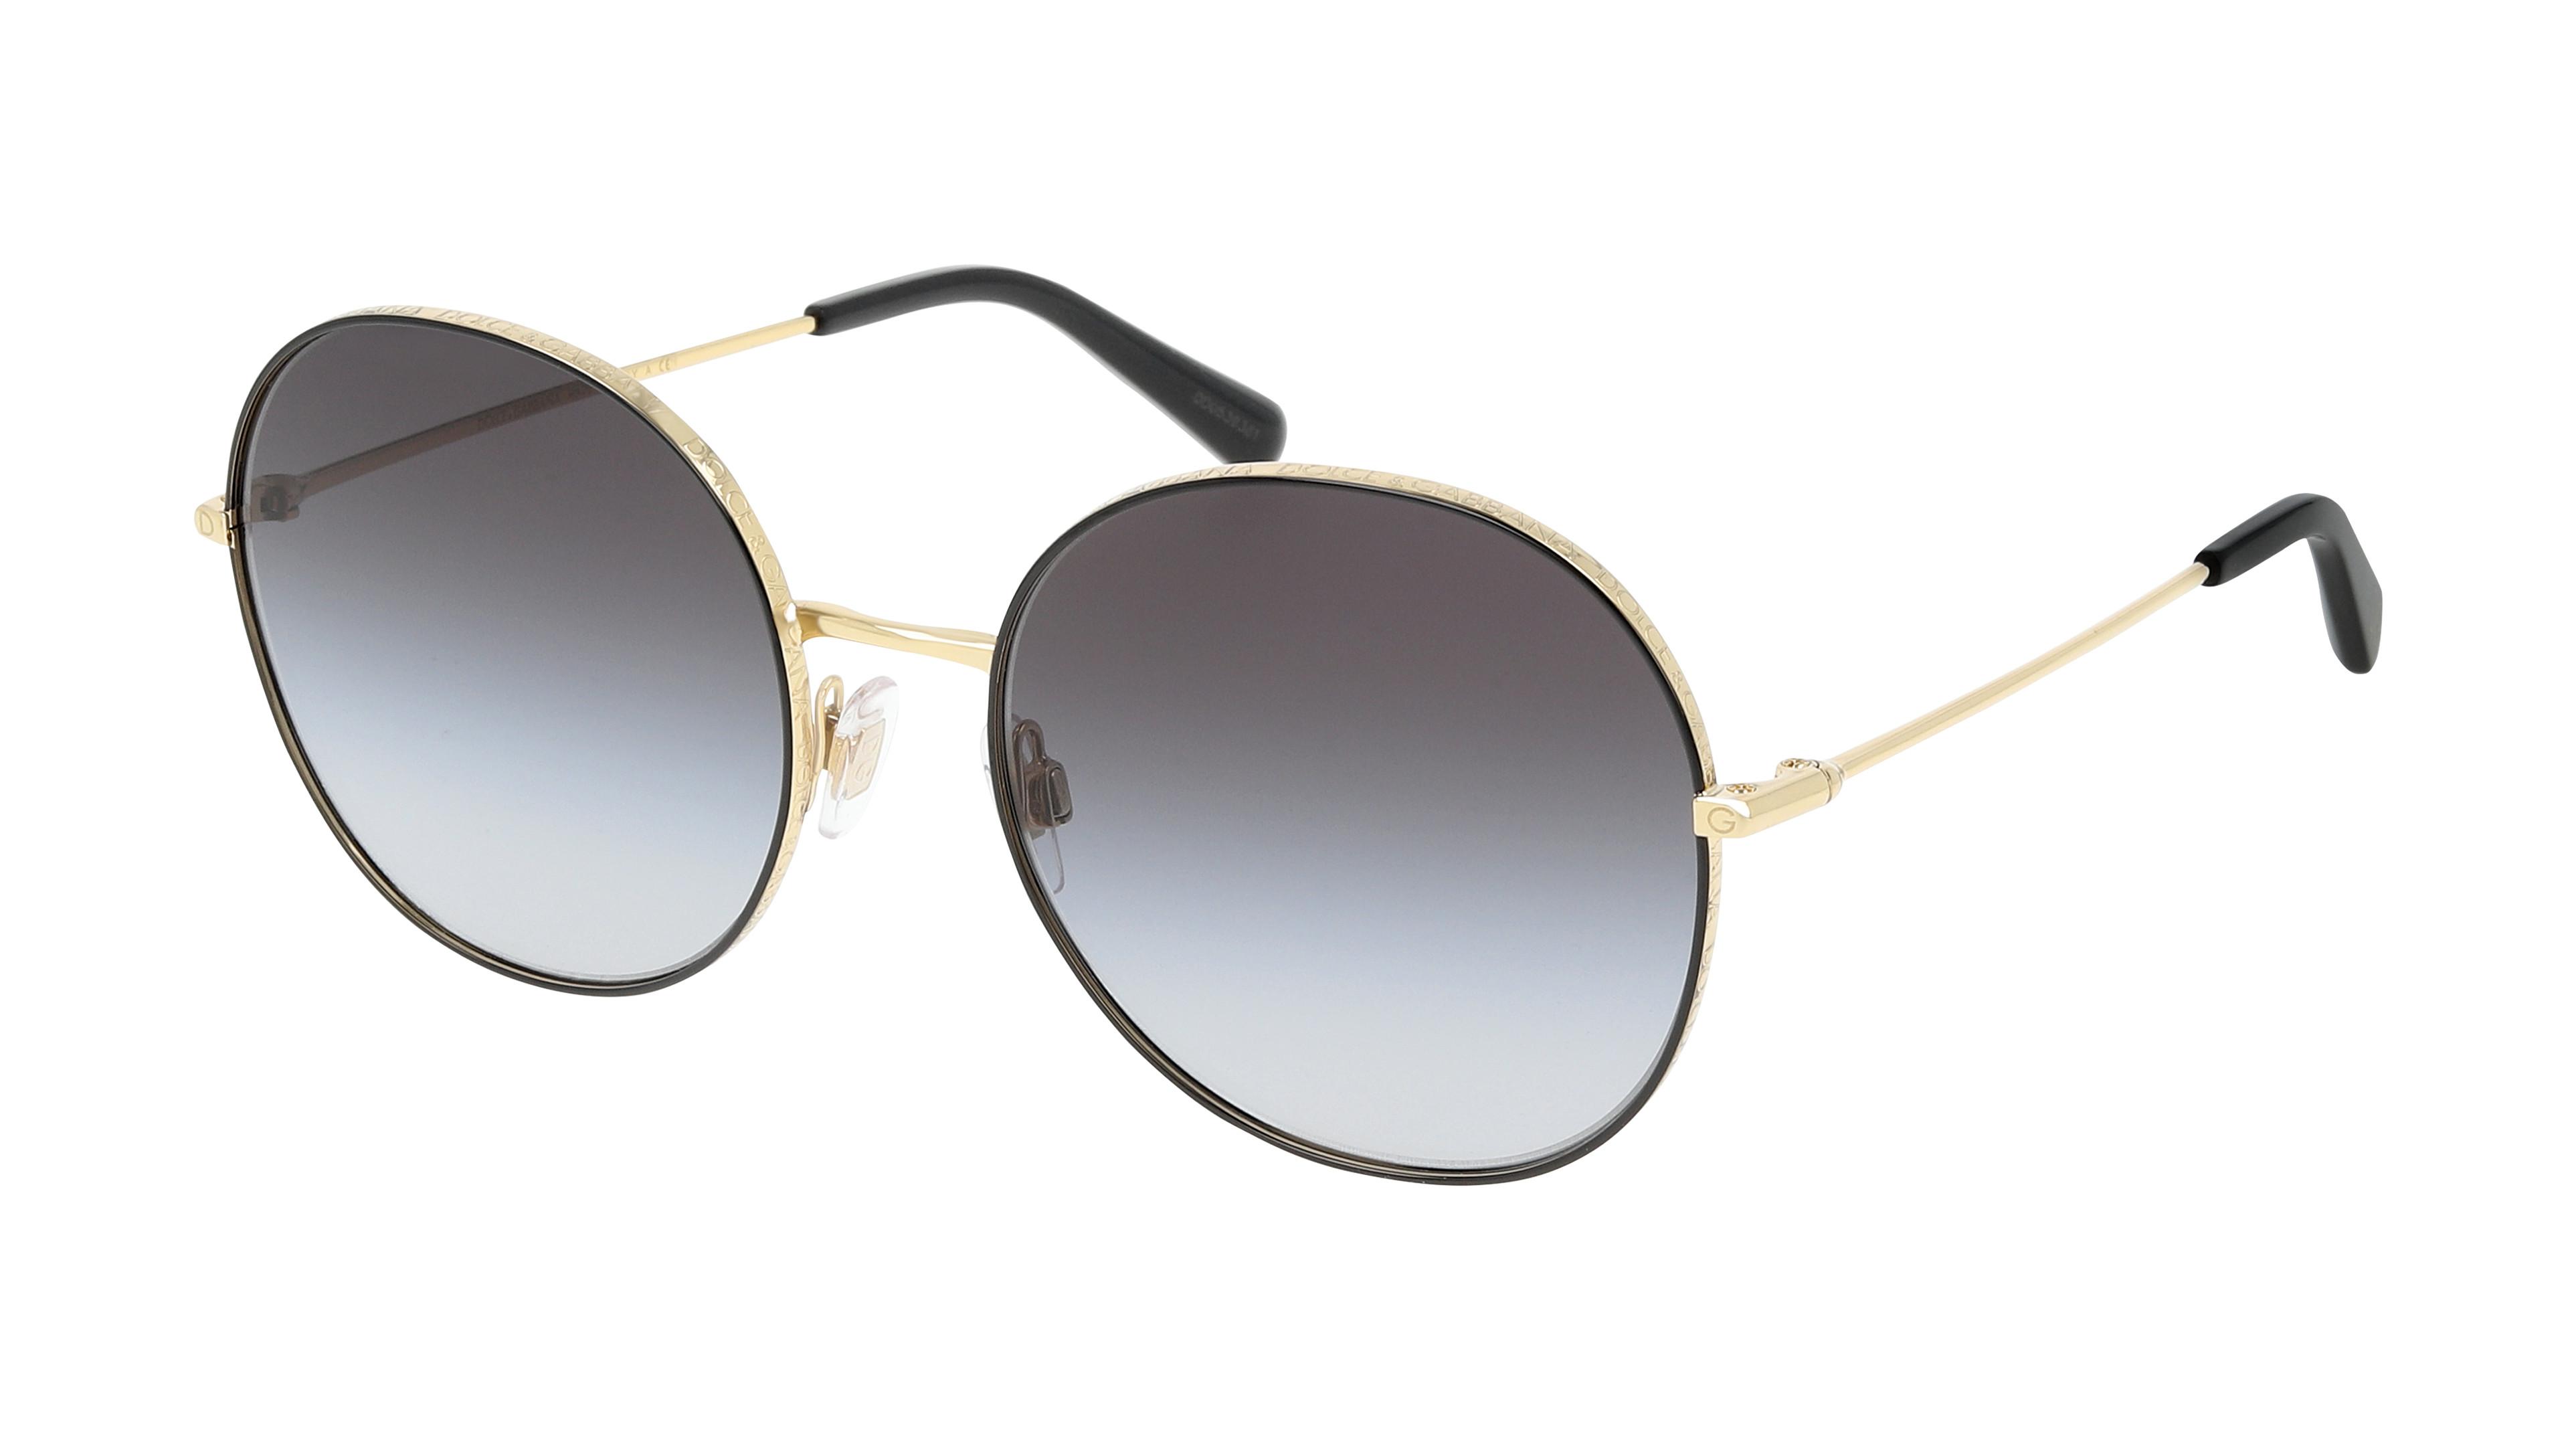 8056597131490-angle-dolce-and-gabbana-sonnenbrille-0dg2243-eyewear-gold-black_2